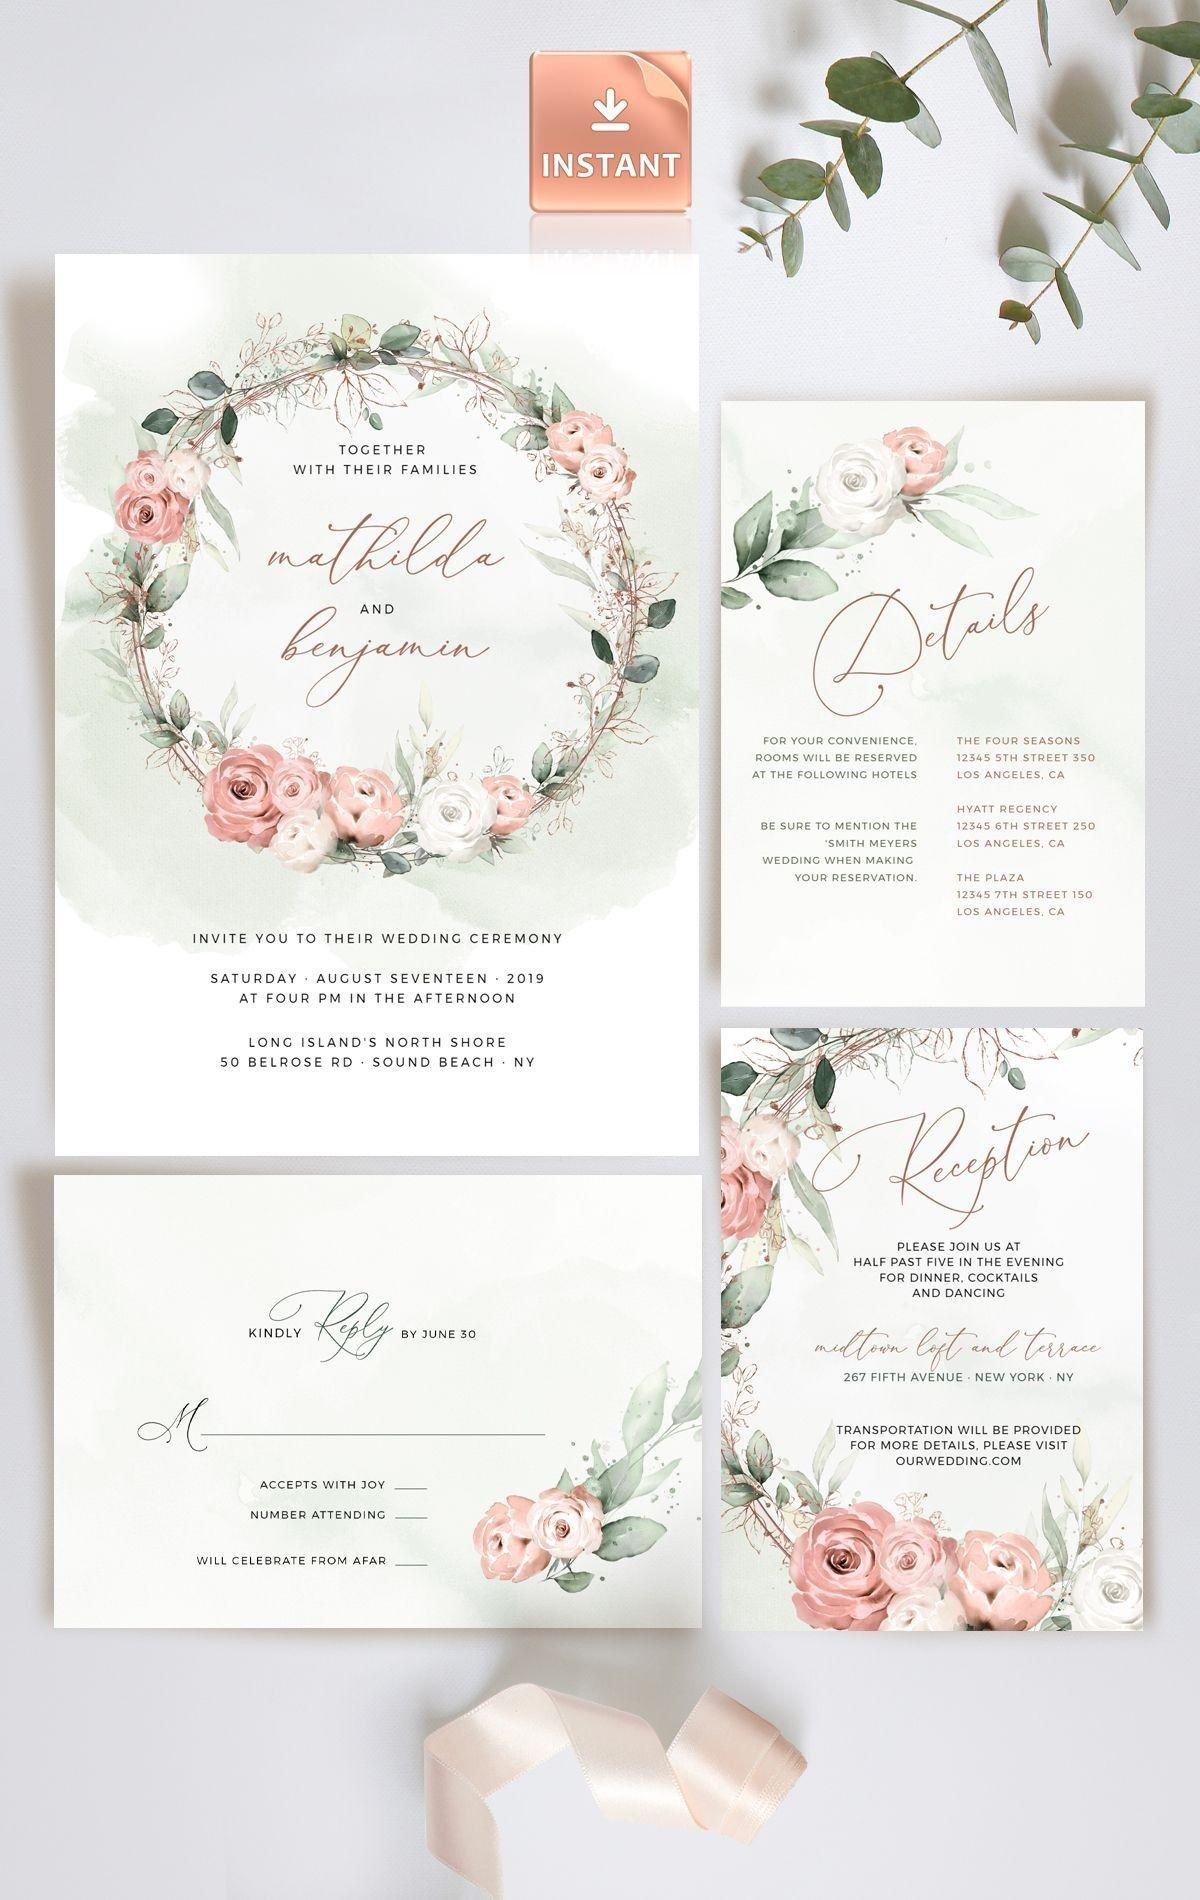 PRINTED Calligraphy Wedding Invitation 7 X 5 Greenery Wedding Invitation RSVP Bundle Minimal Wedding Customize Wedding Invitation